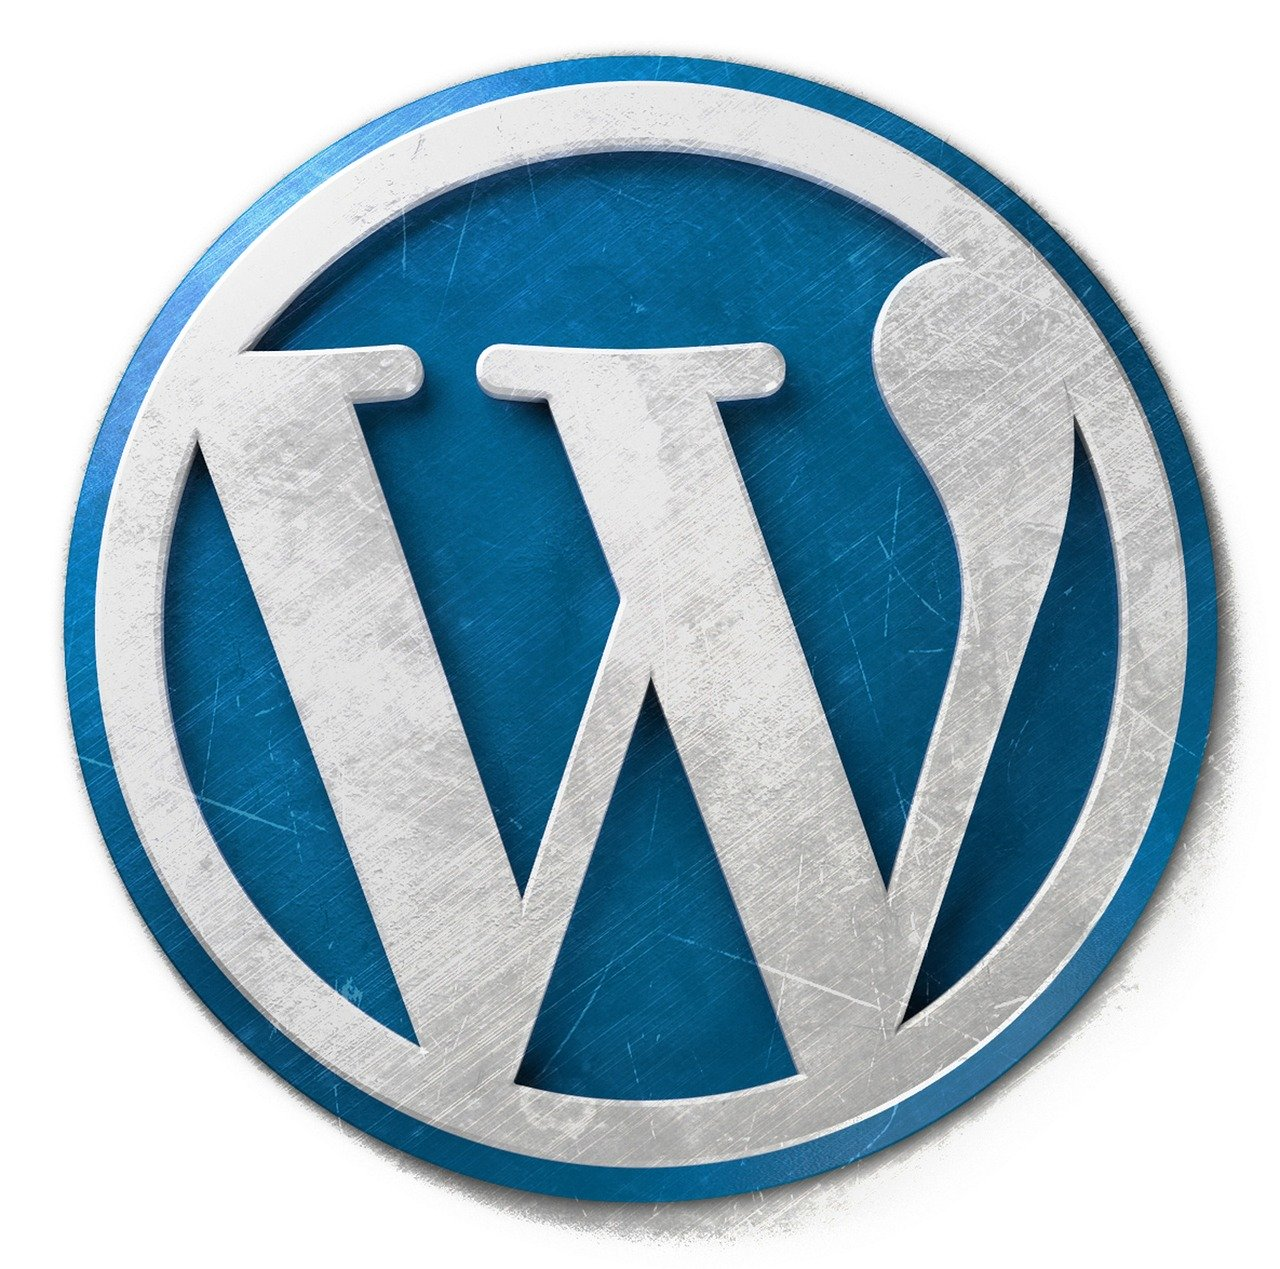 Création d'un site Internet Châtellerault avec WordPress